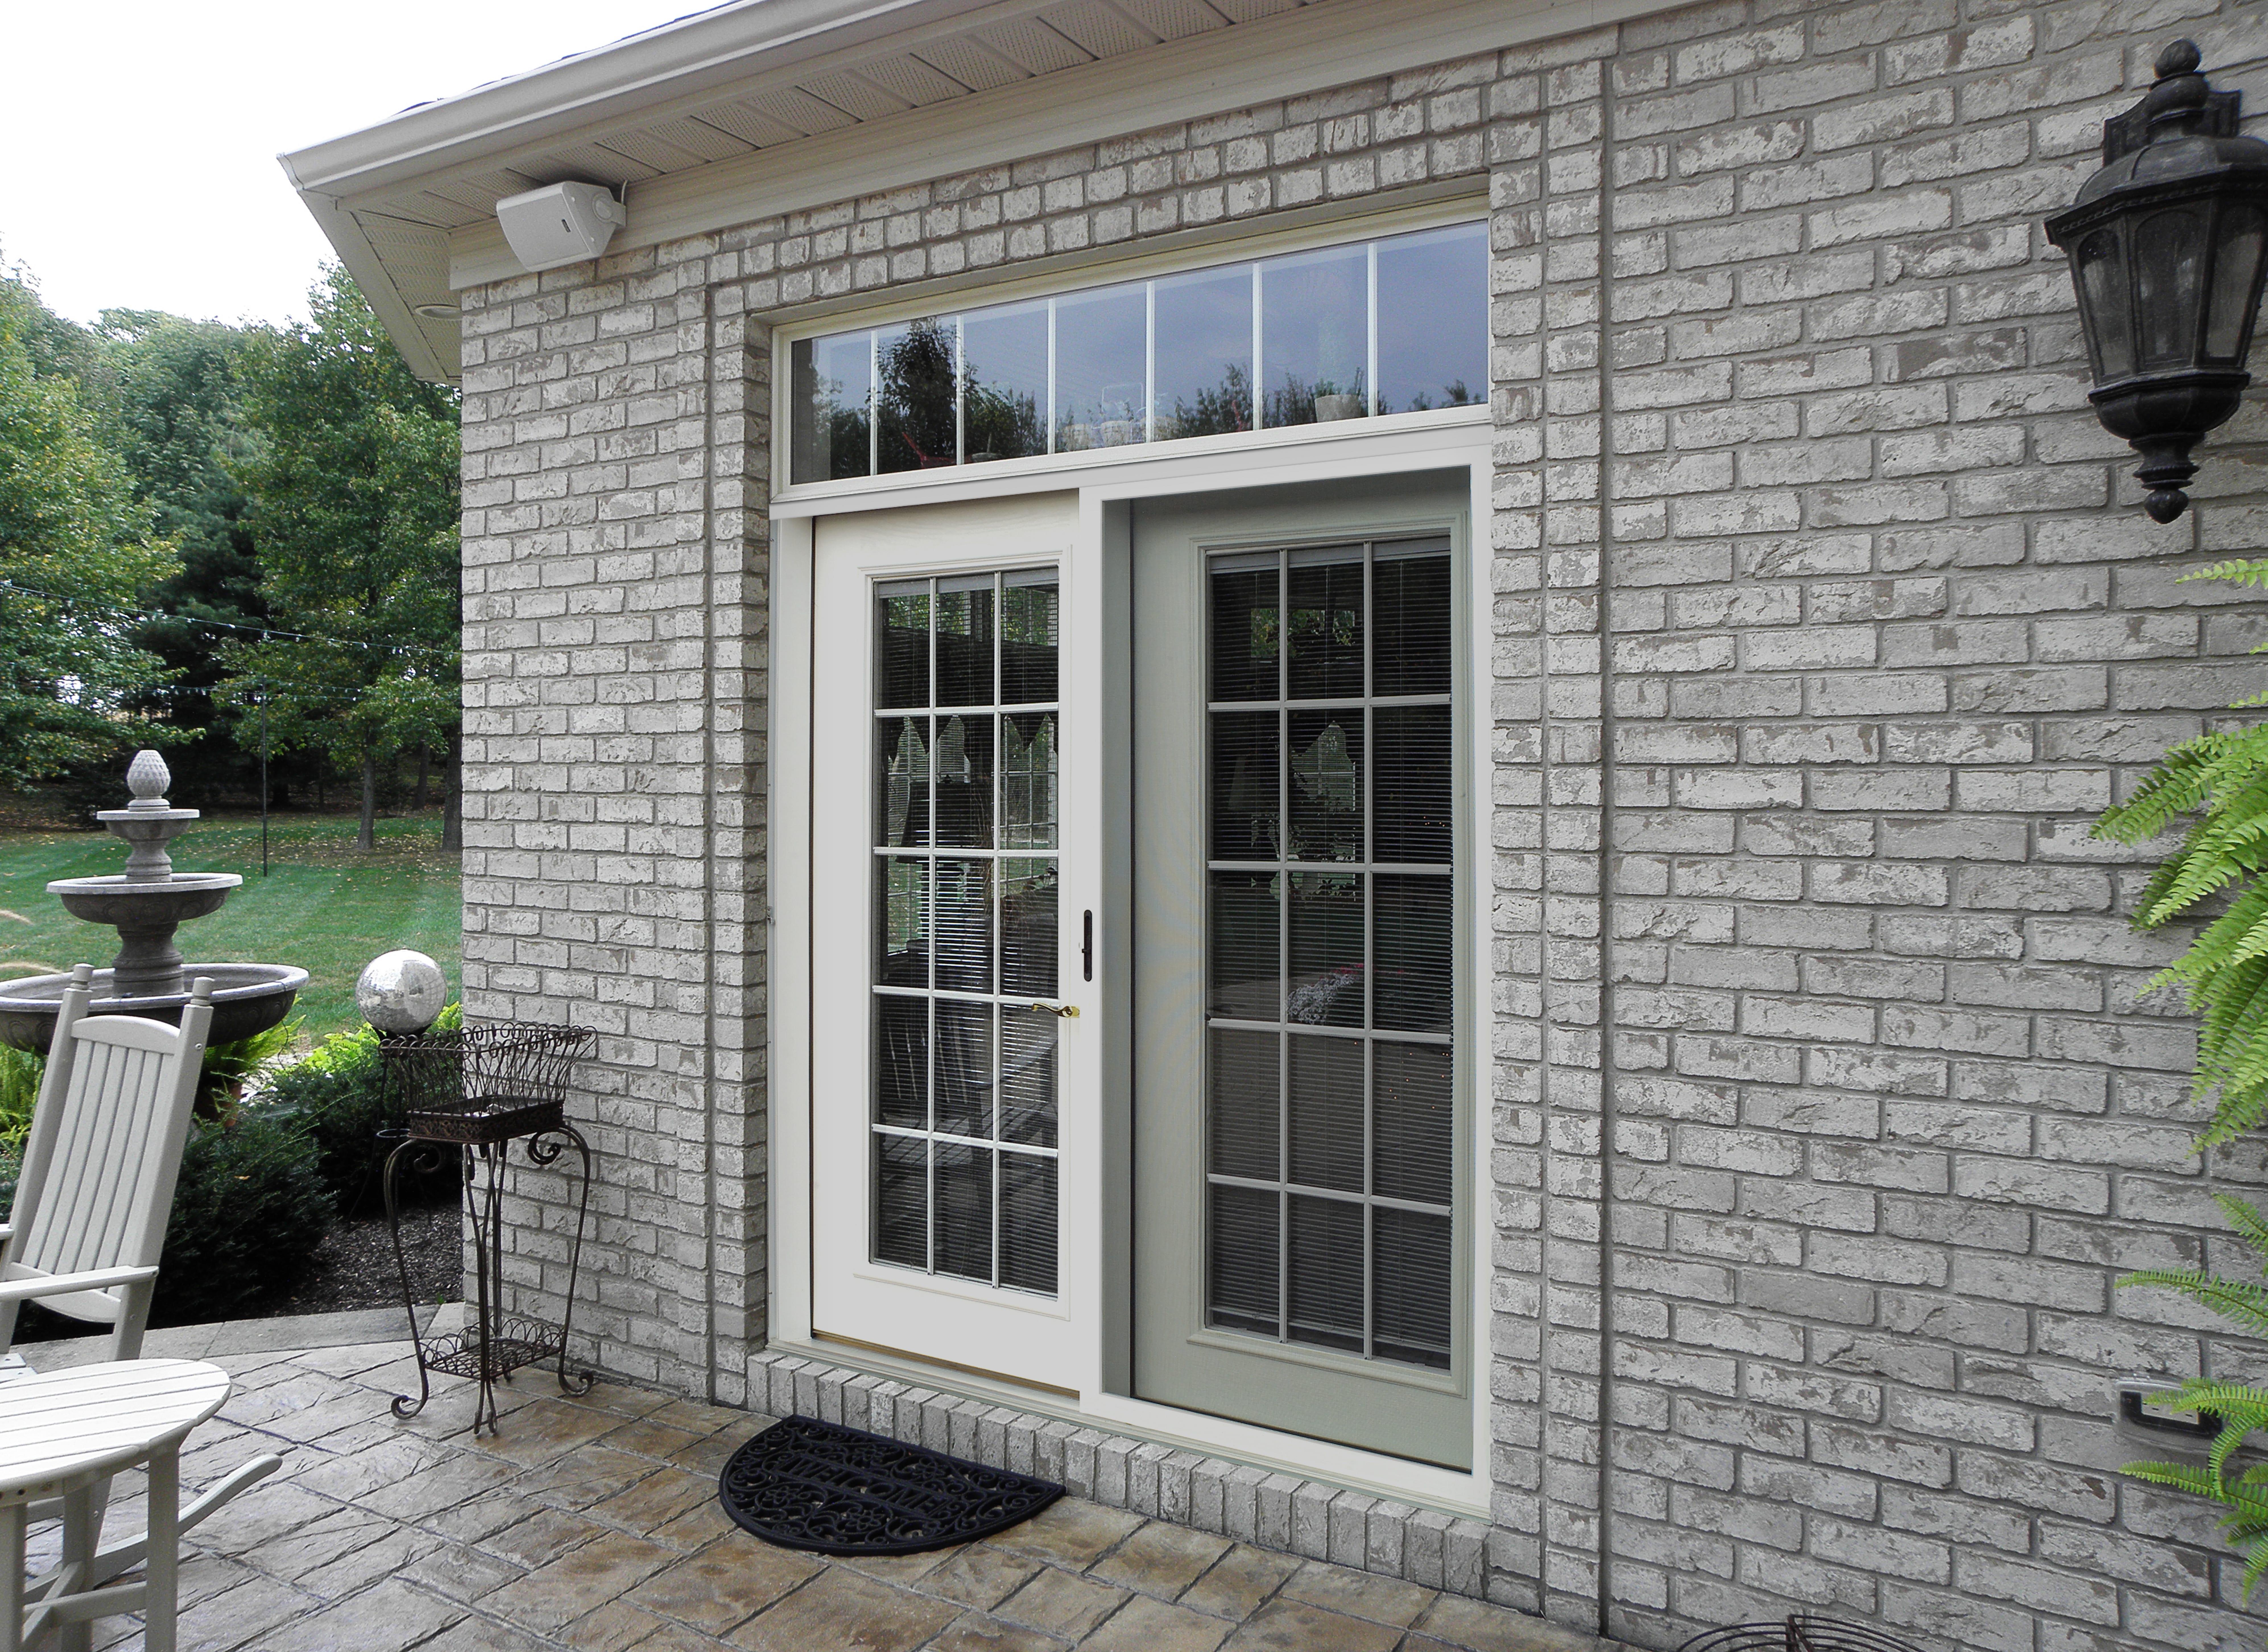 Best Replacement Patio Doors Offer Many Custom Design